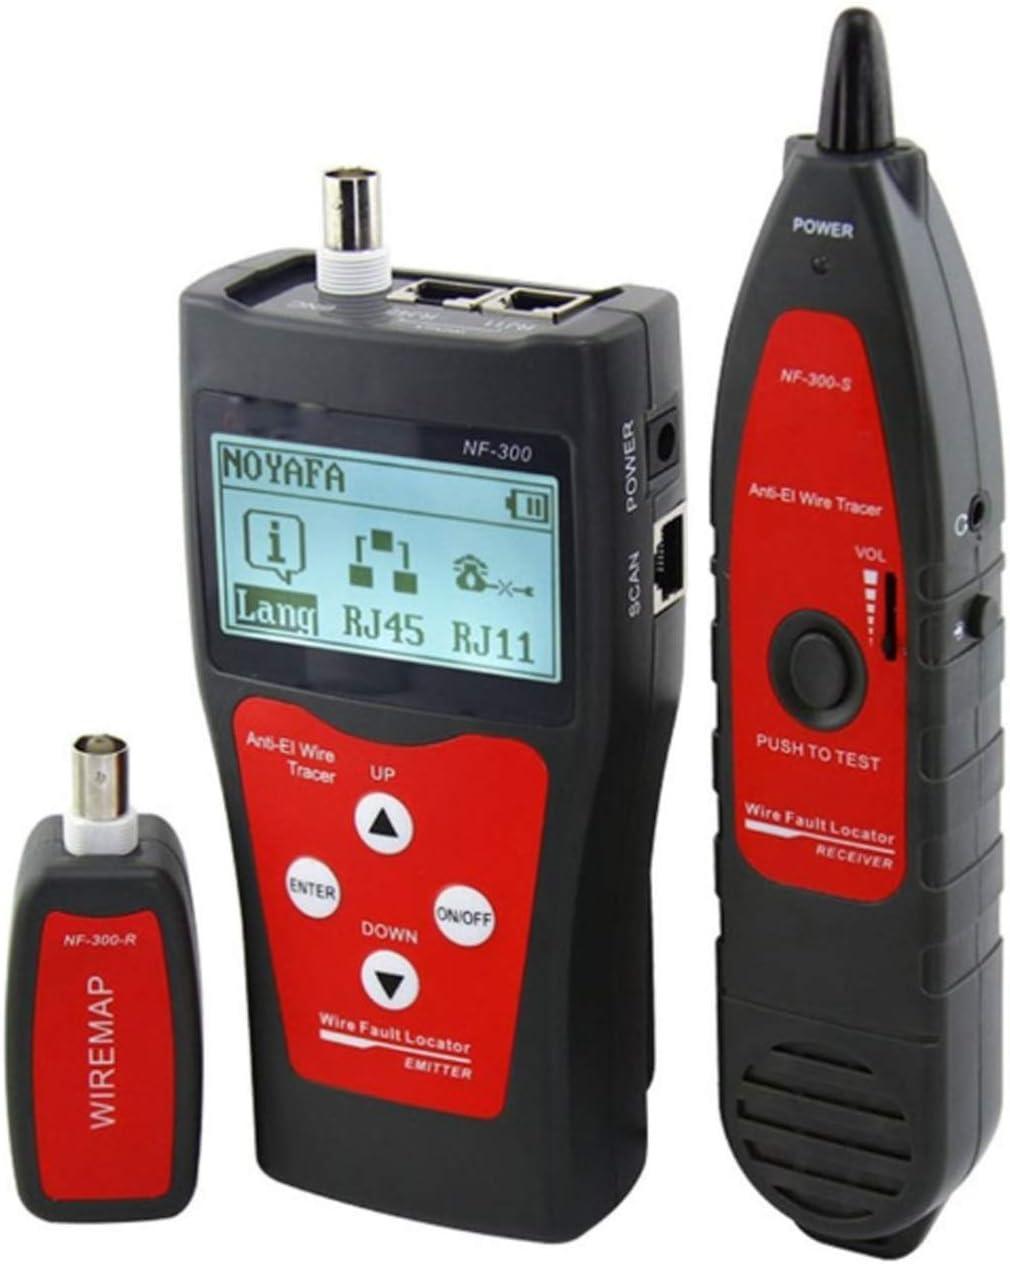 YXZQ 40% OFF Cheap Sale Regular store Line Finder NF-300 Professional Lengt Tester Cable LAN RJ45